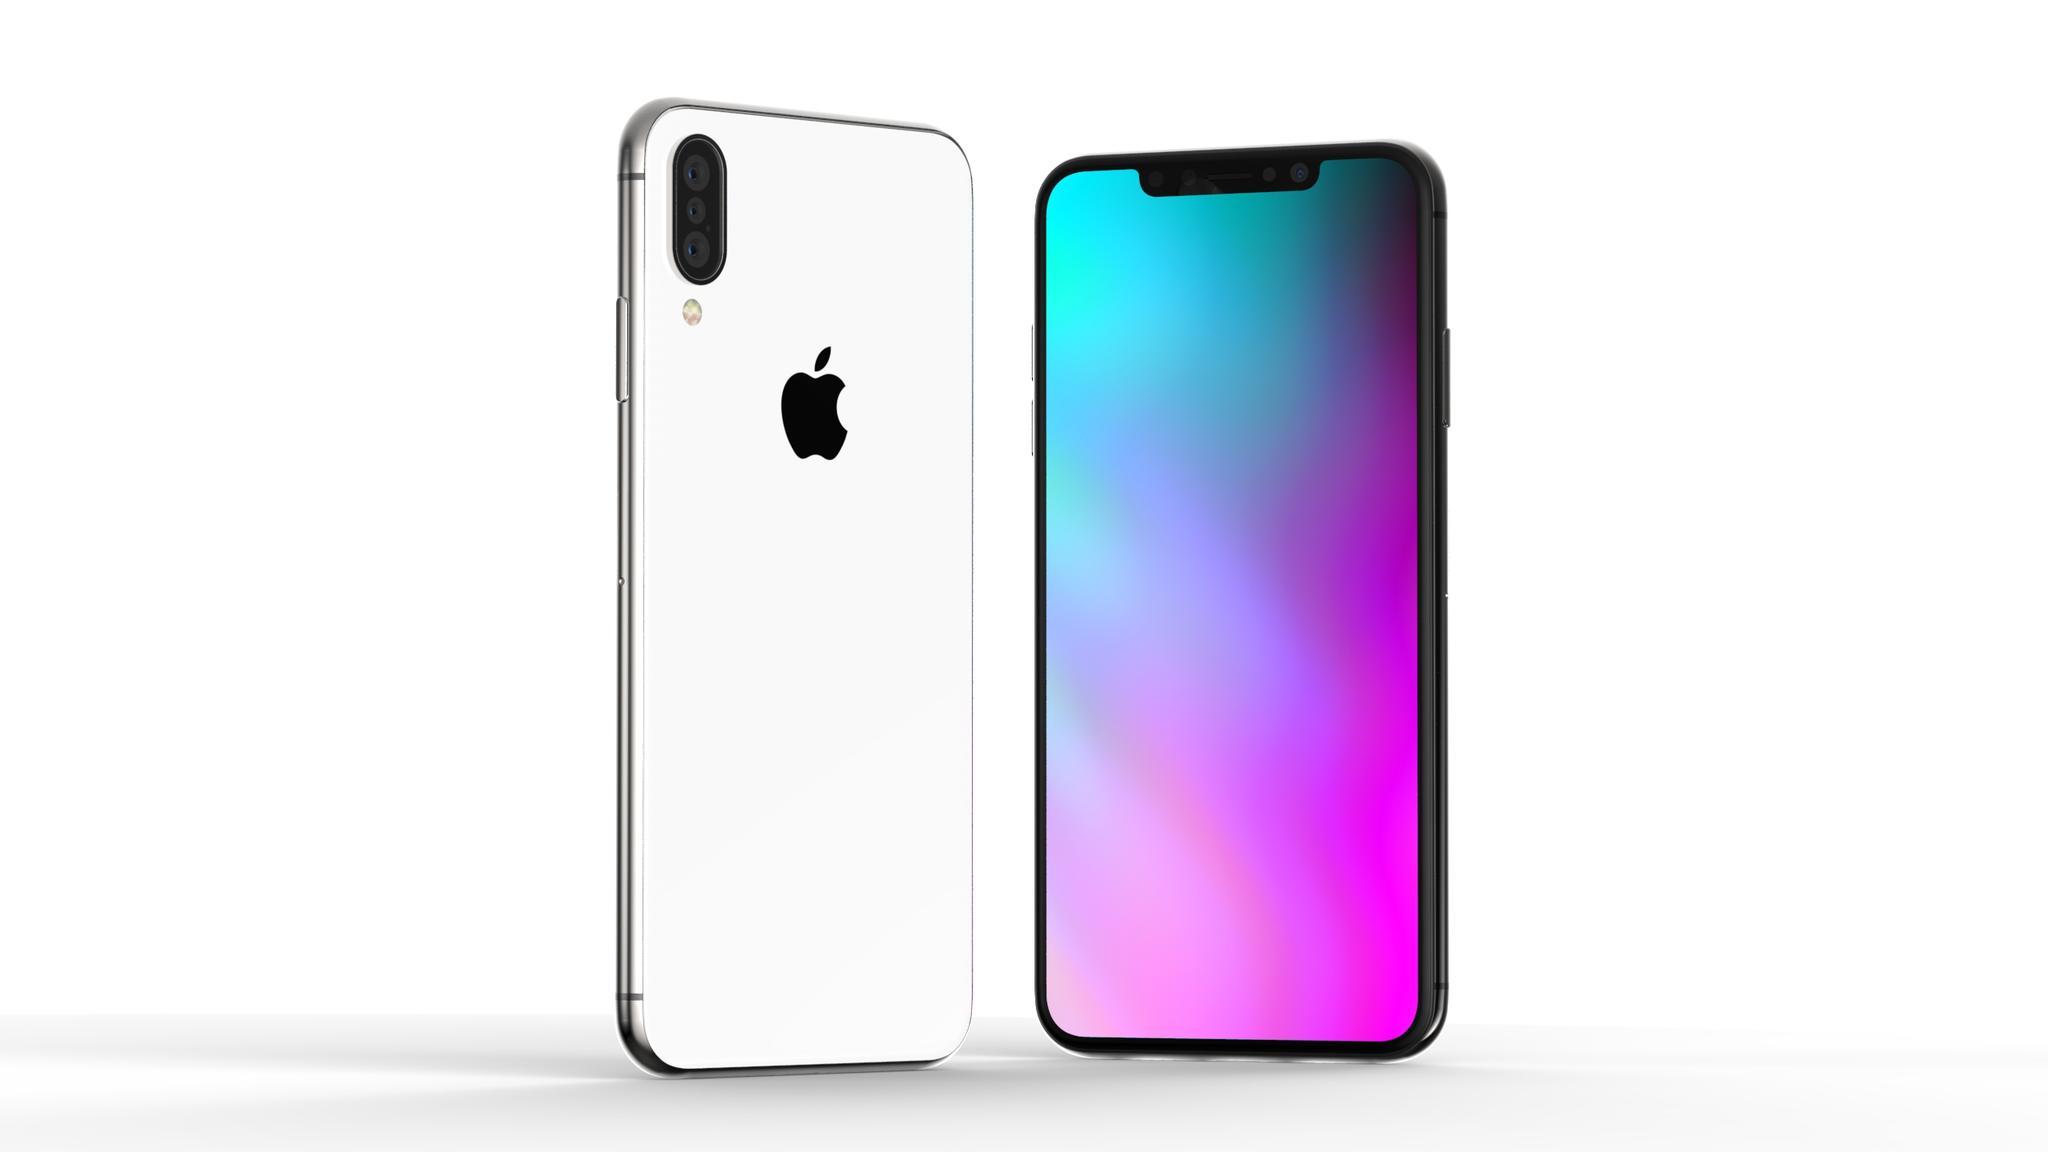 Konzept des iPhone X (2018) mit Triple-Kamera